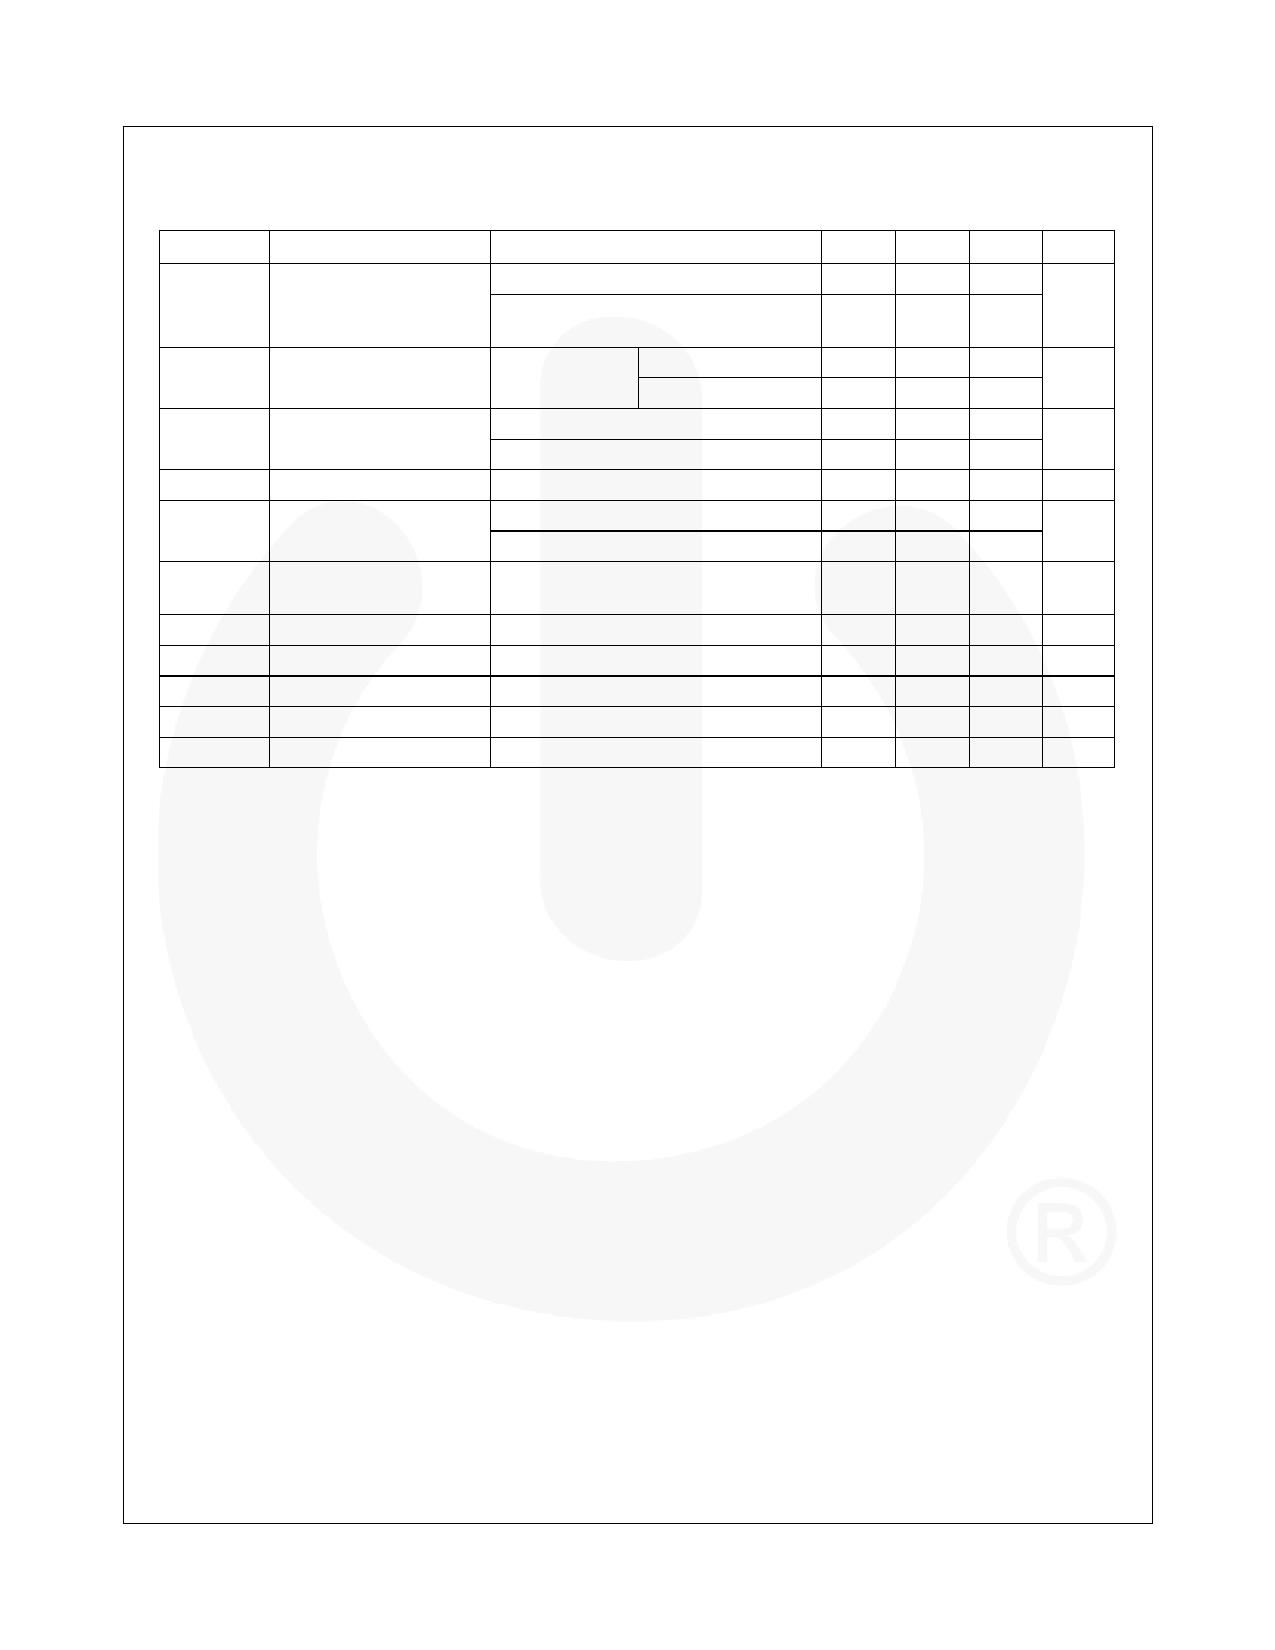 KA7906 pdf, ピン配列